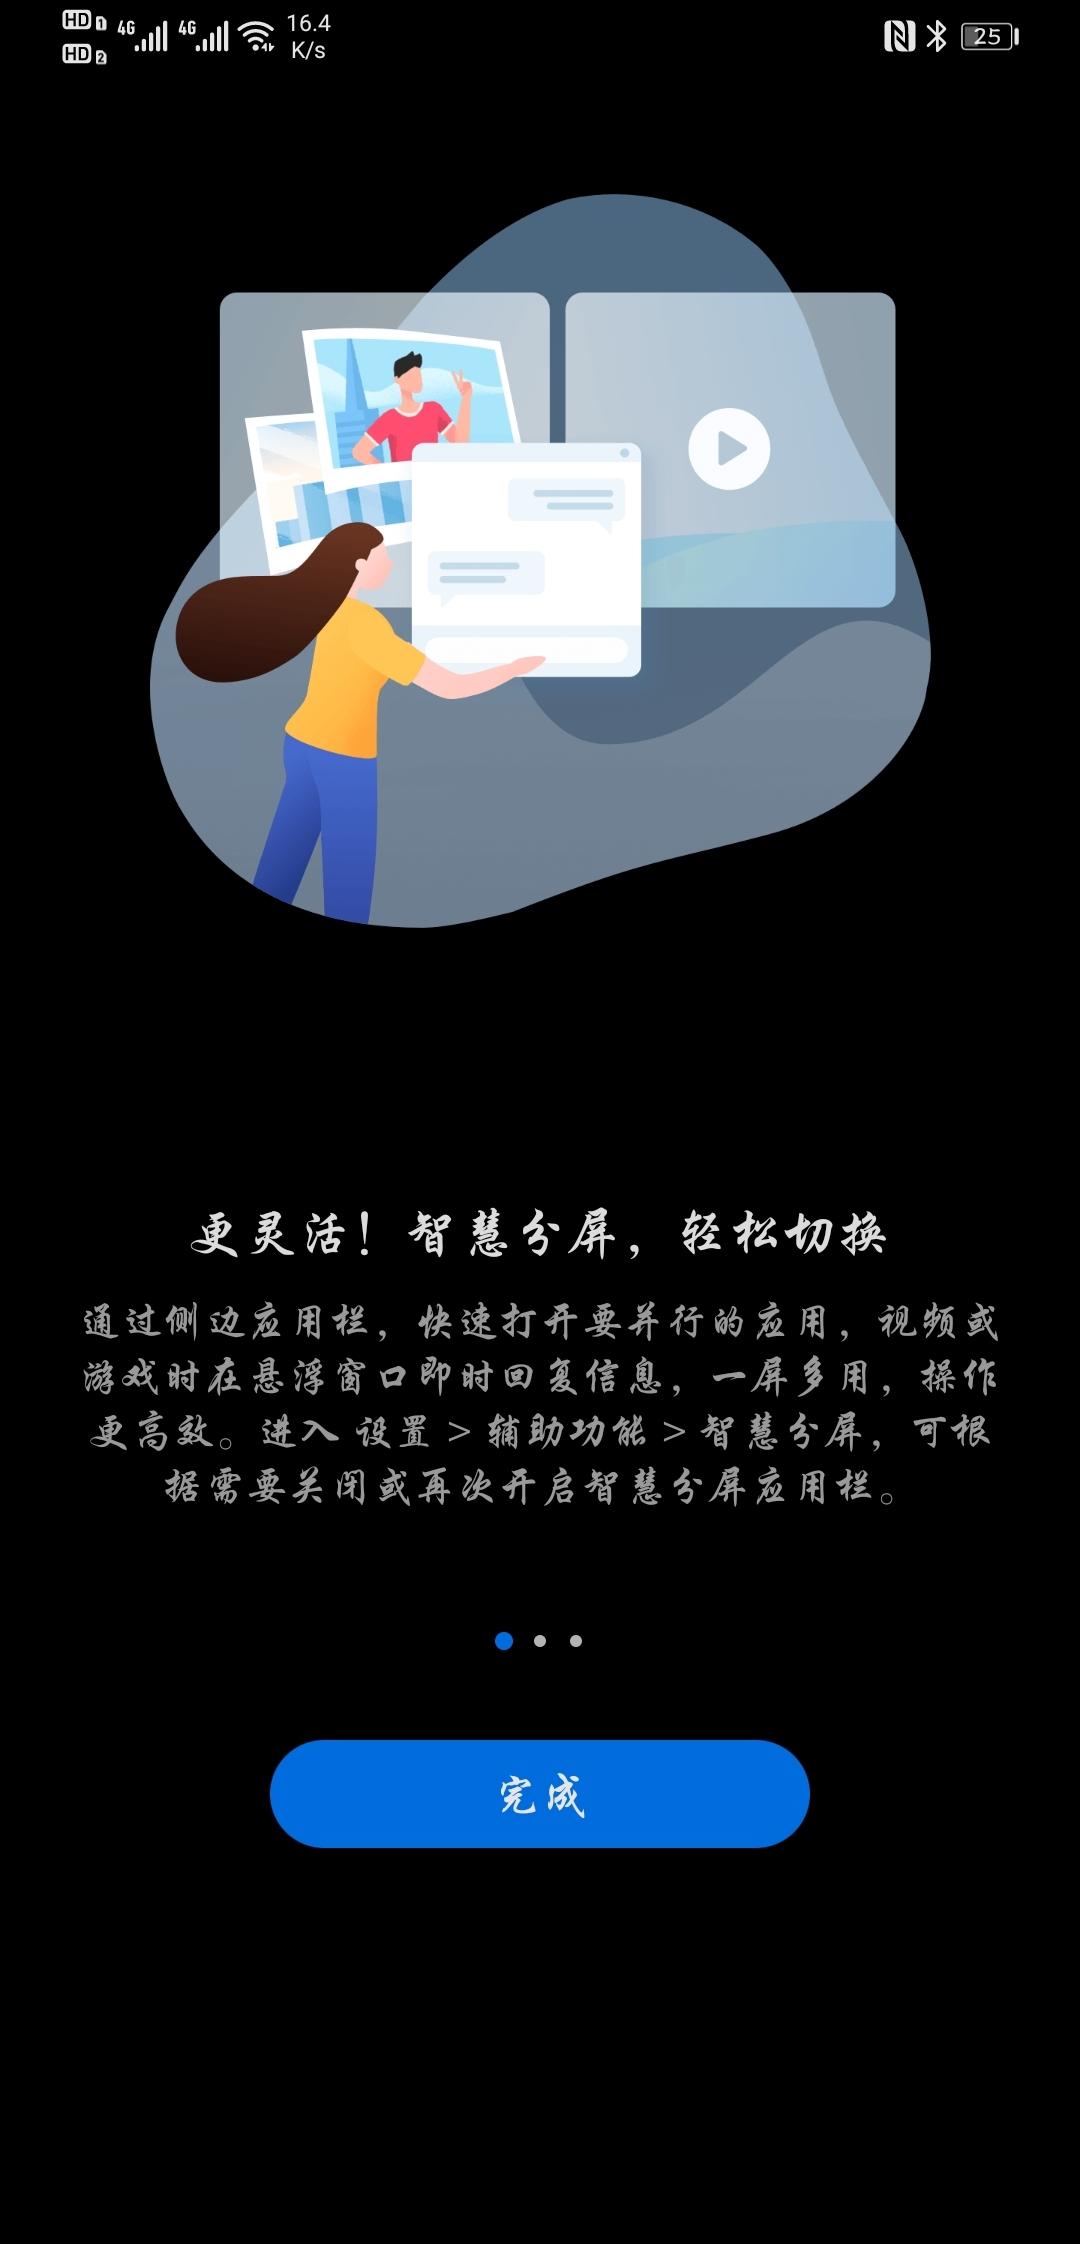 Screenshot_20200515_081102_com.huawei.android.hwupgradeguide.jpg